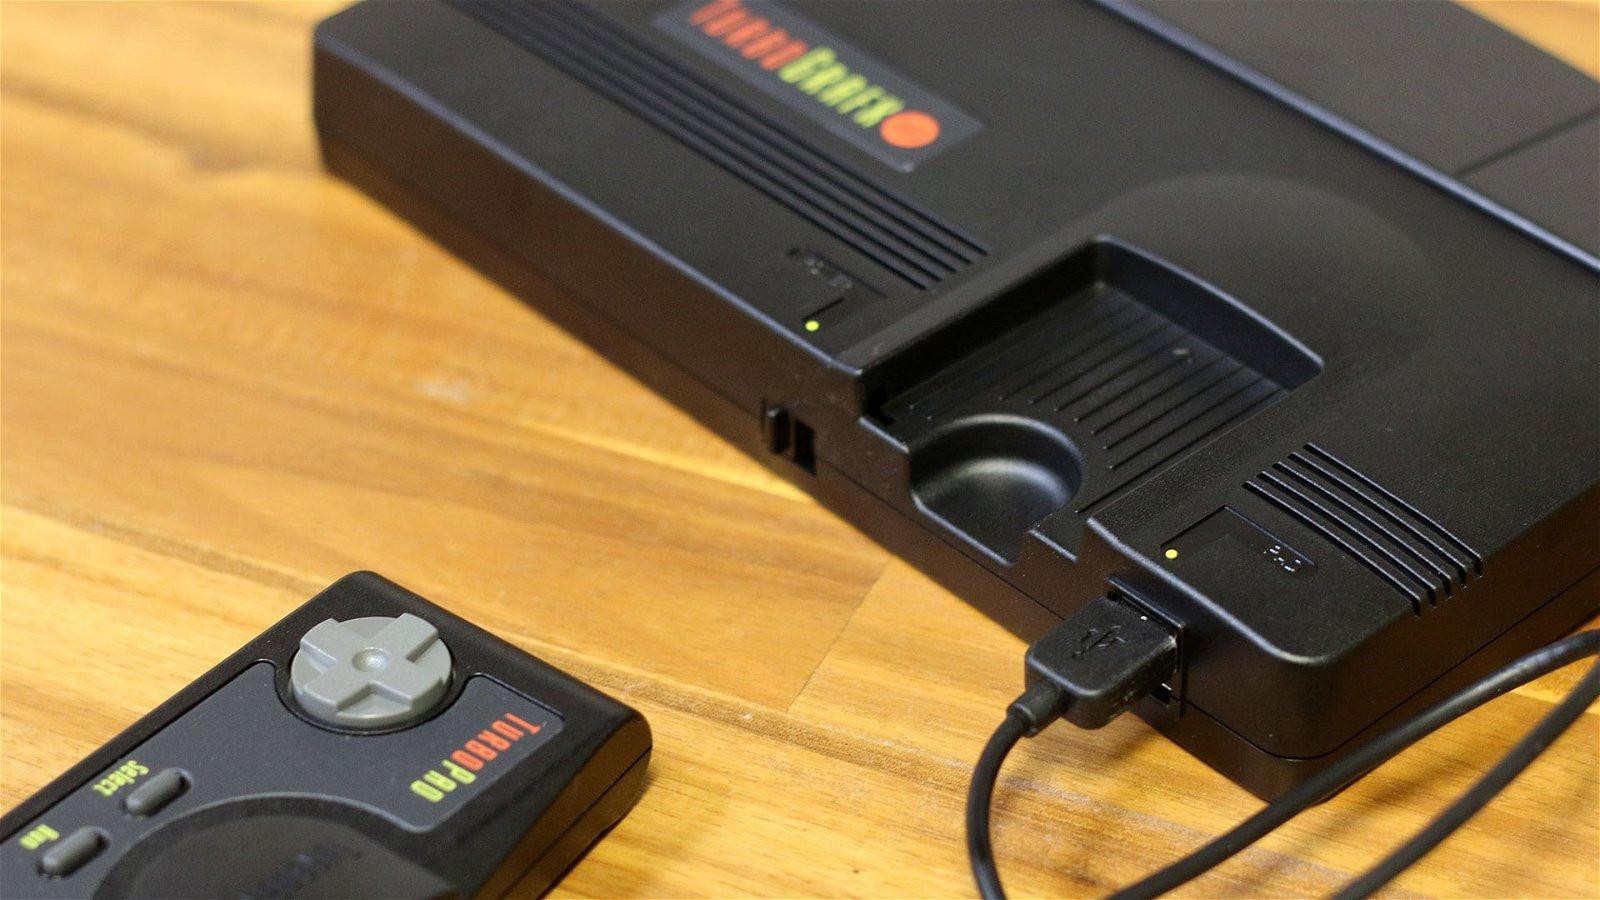 TurboGrafx-16 Mini Review 1